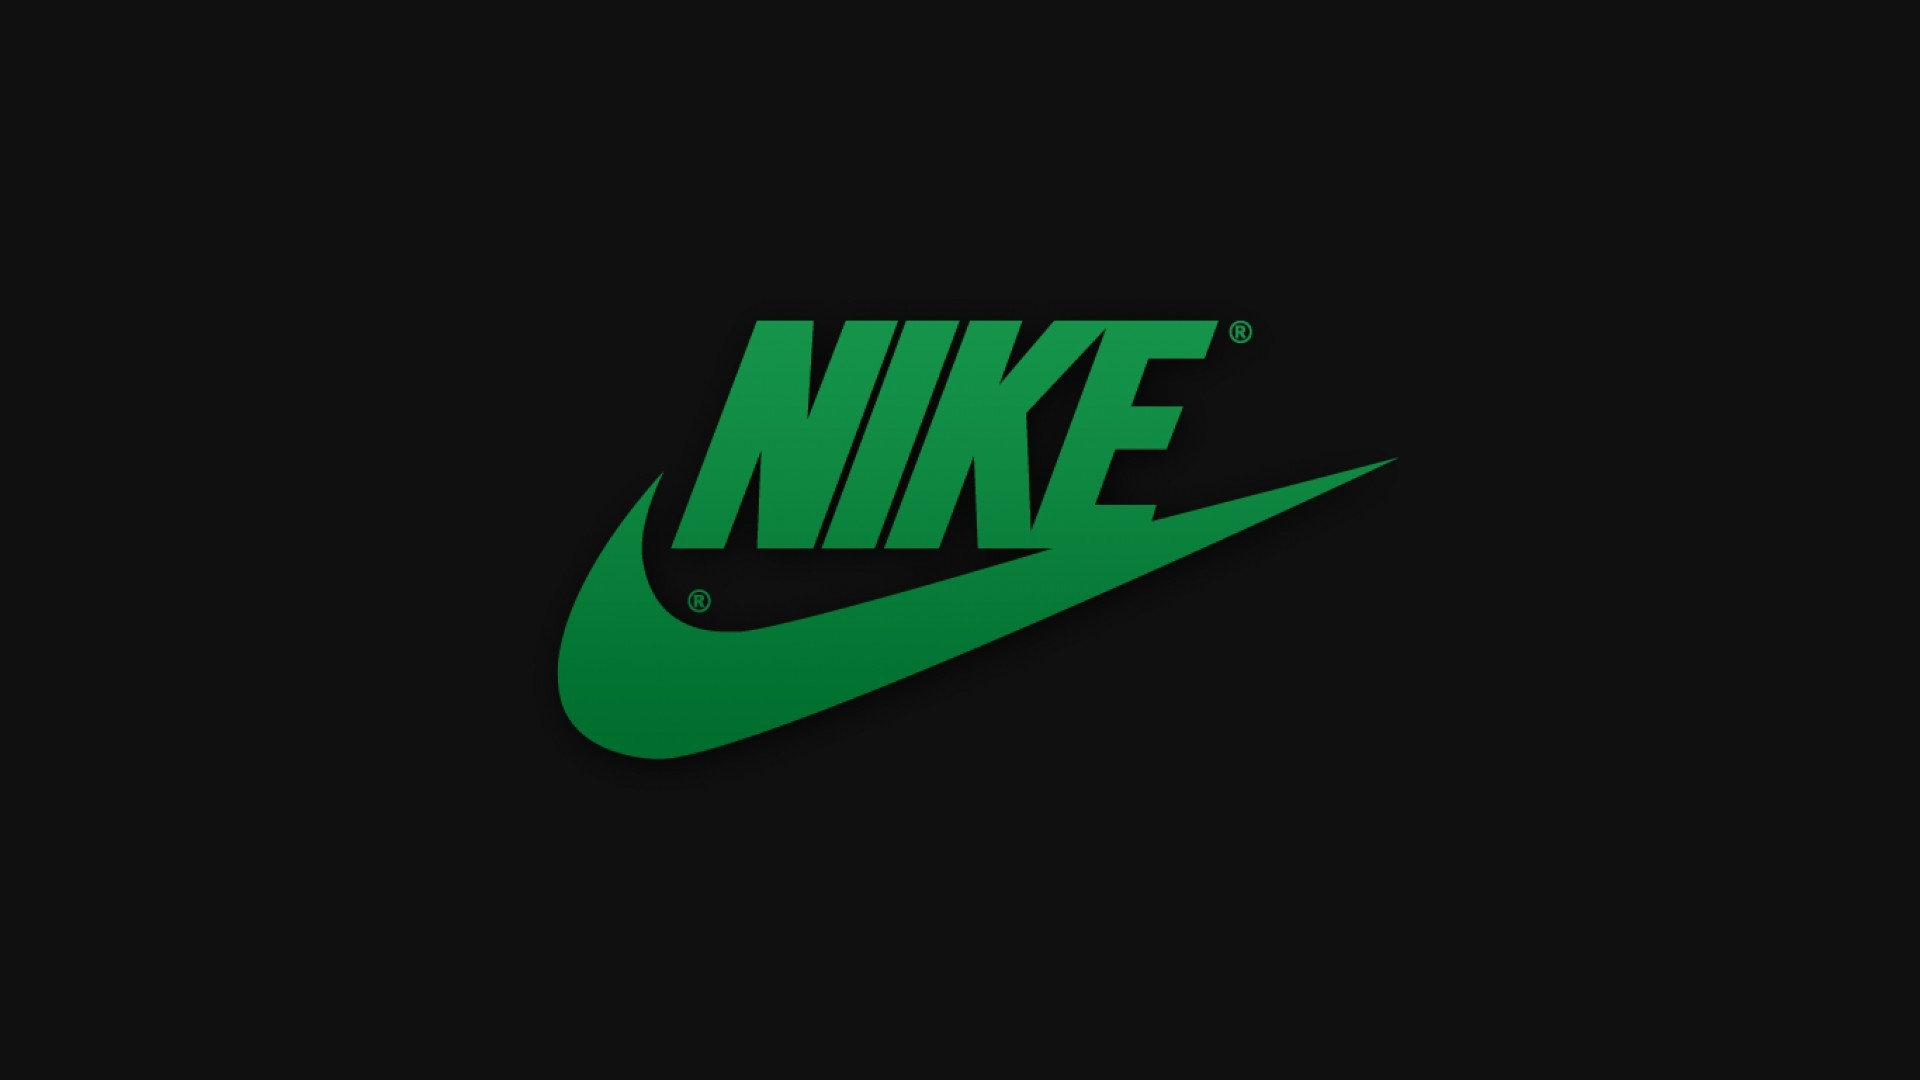 Green Nike Logo Wallpaper HD 5 High Resolution Wallpaper Full Size